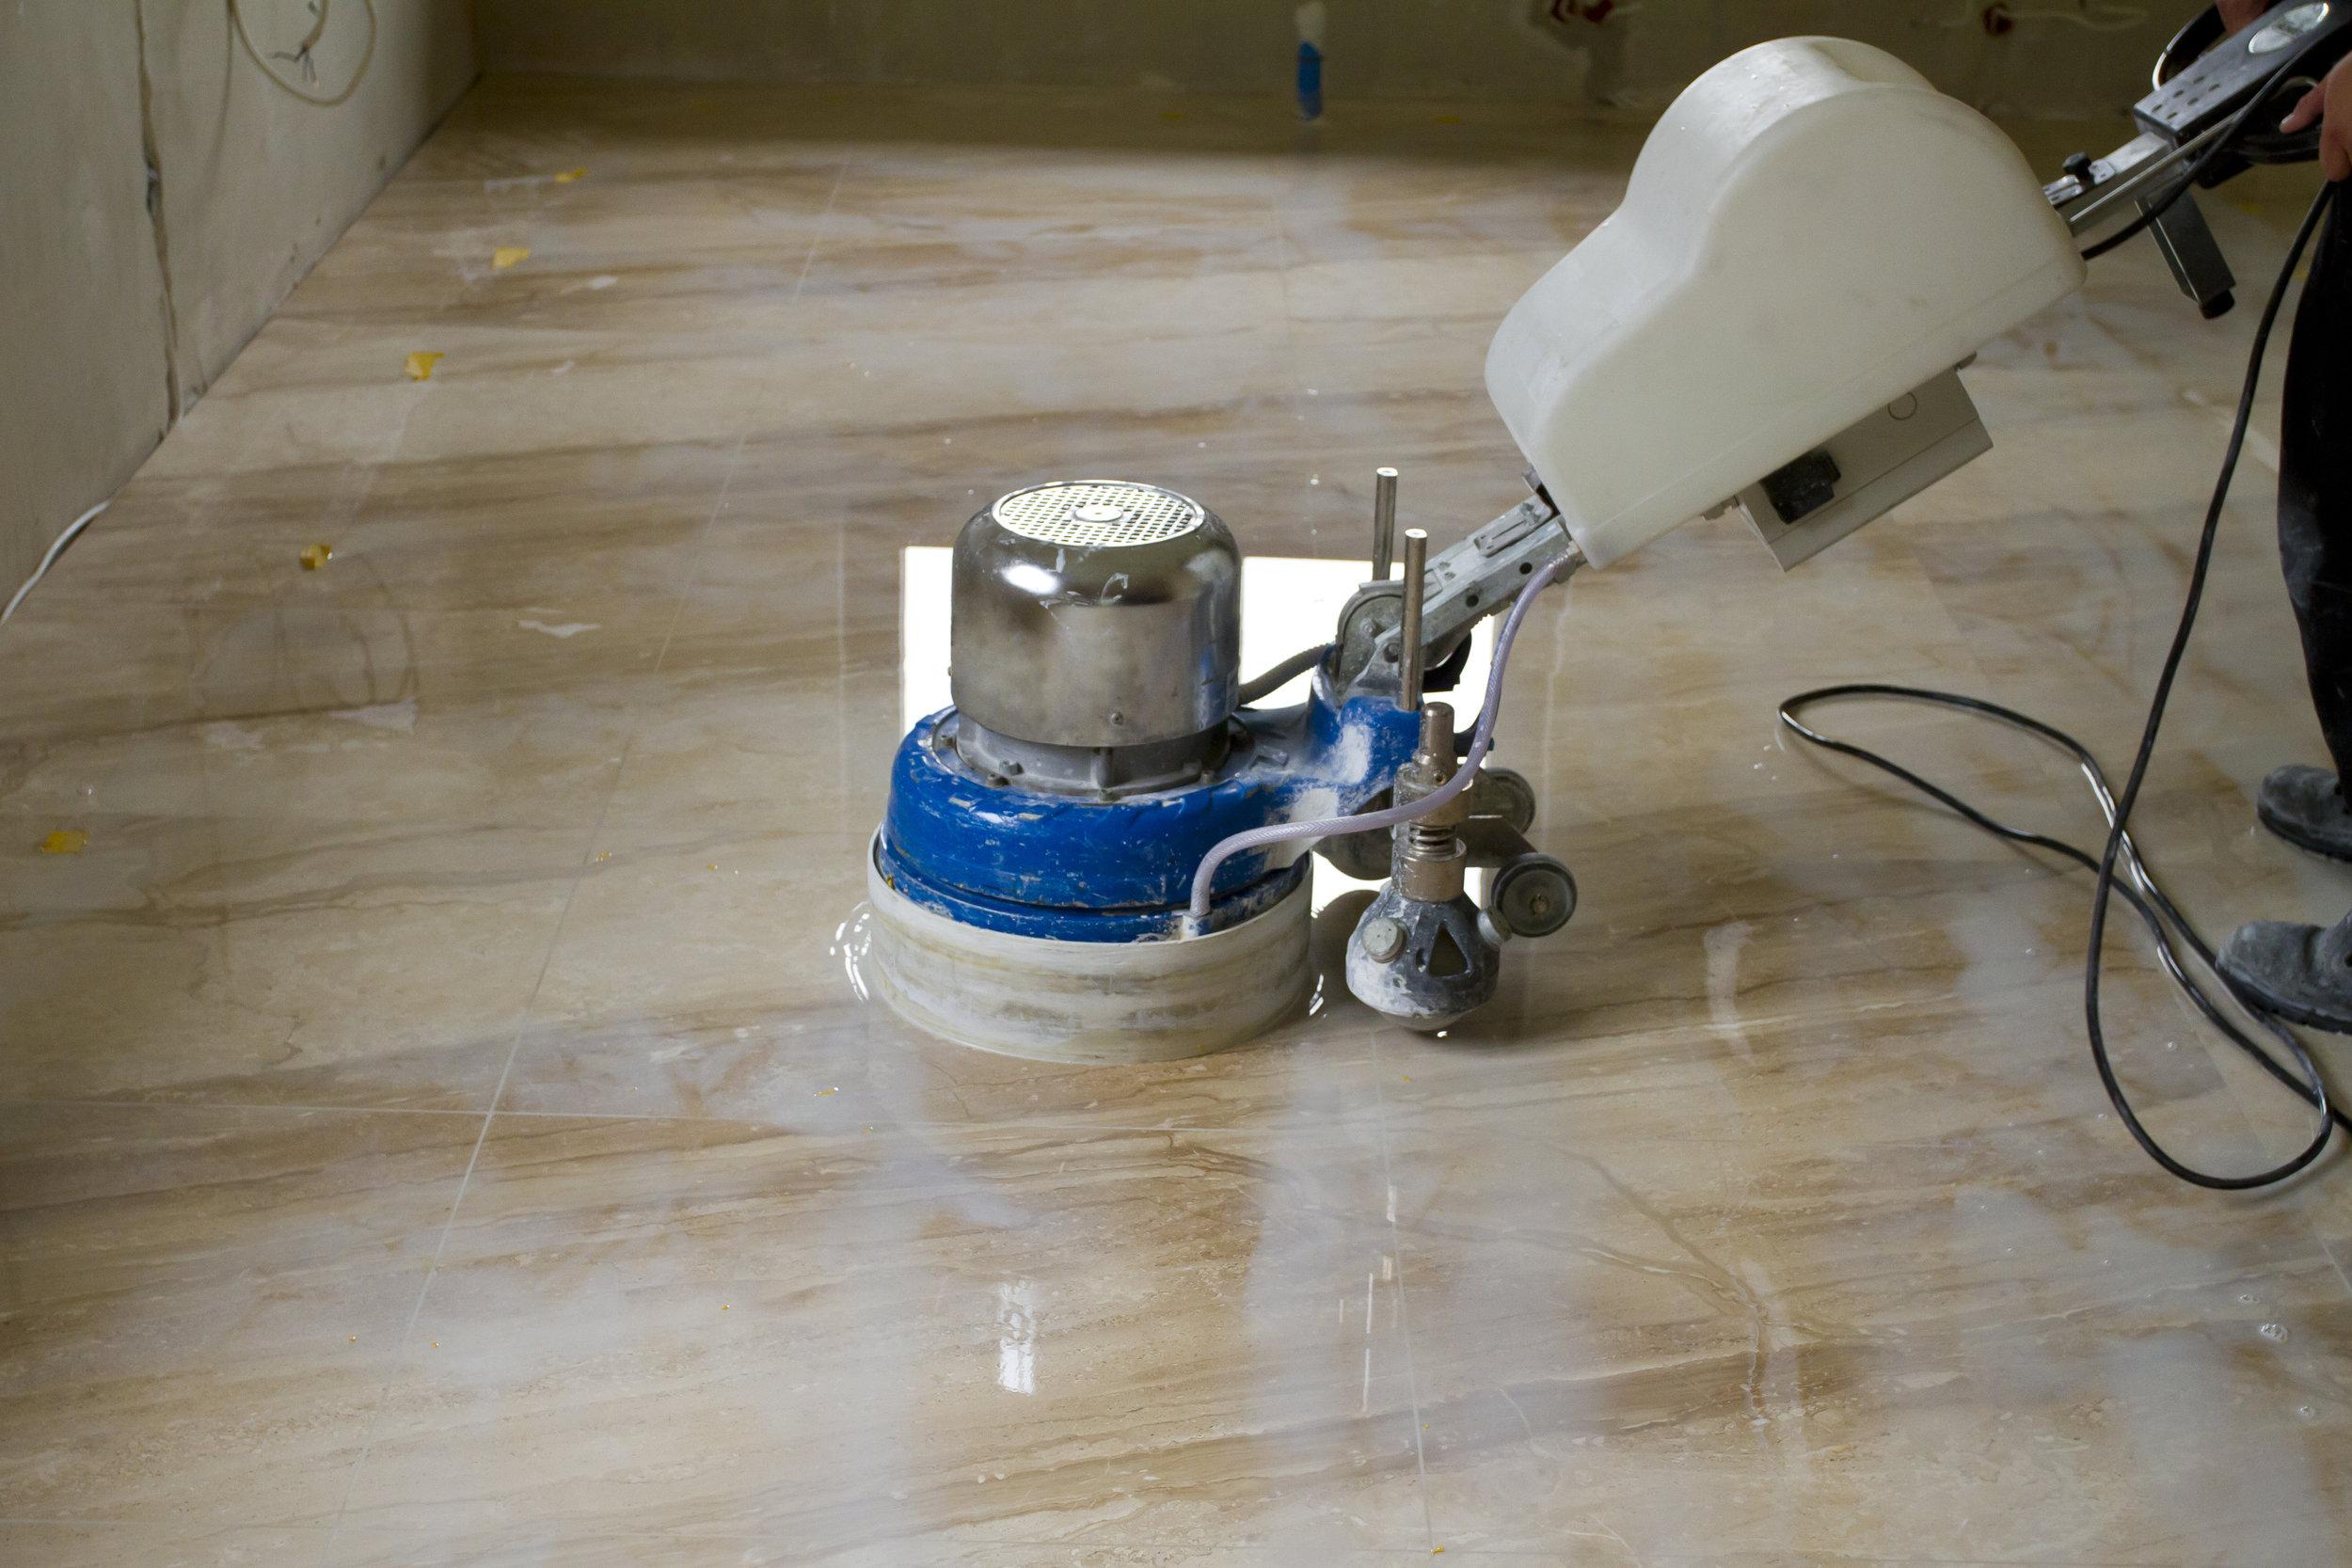 Polishing machine in action.jpeg